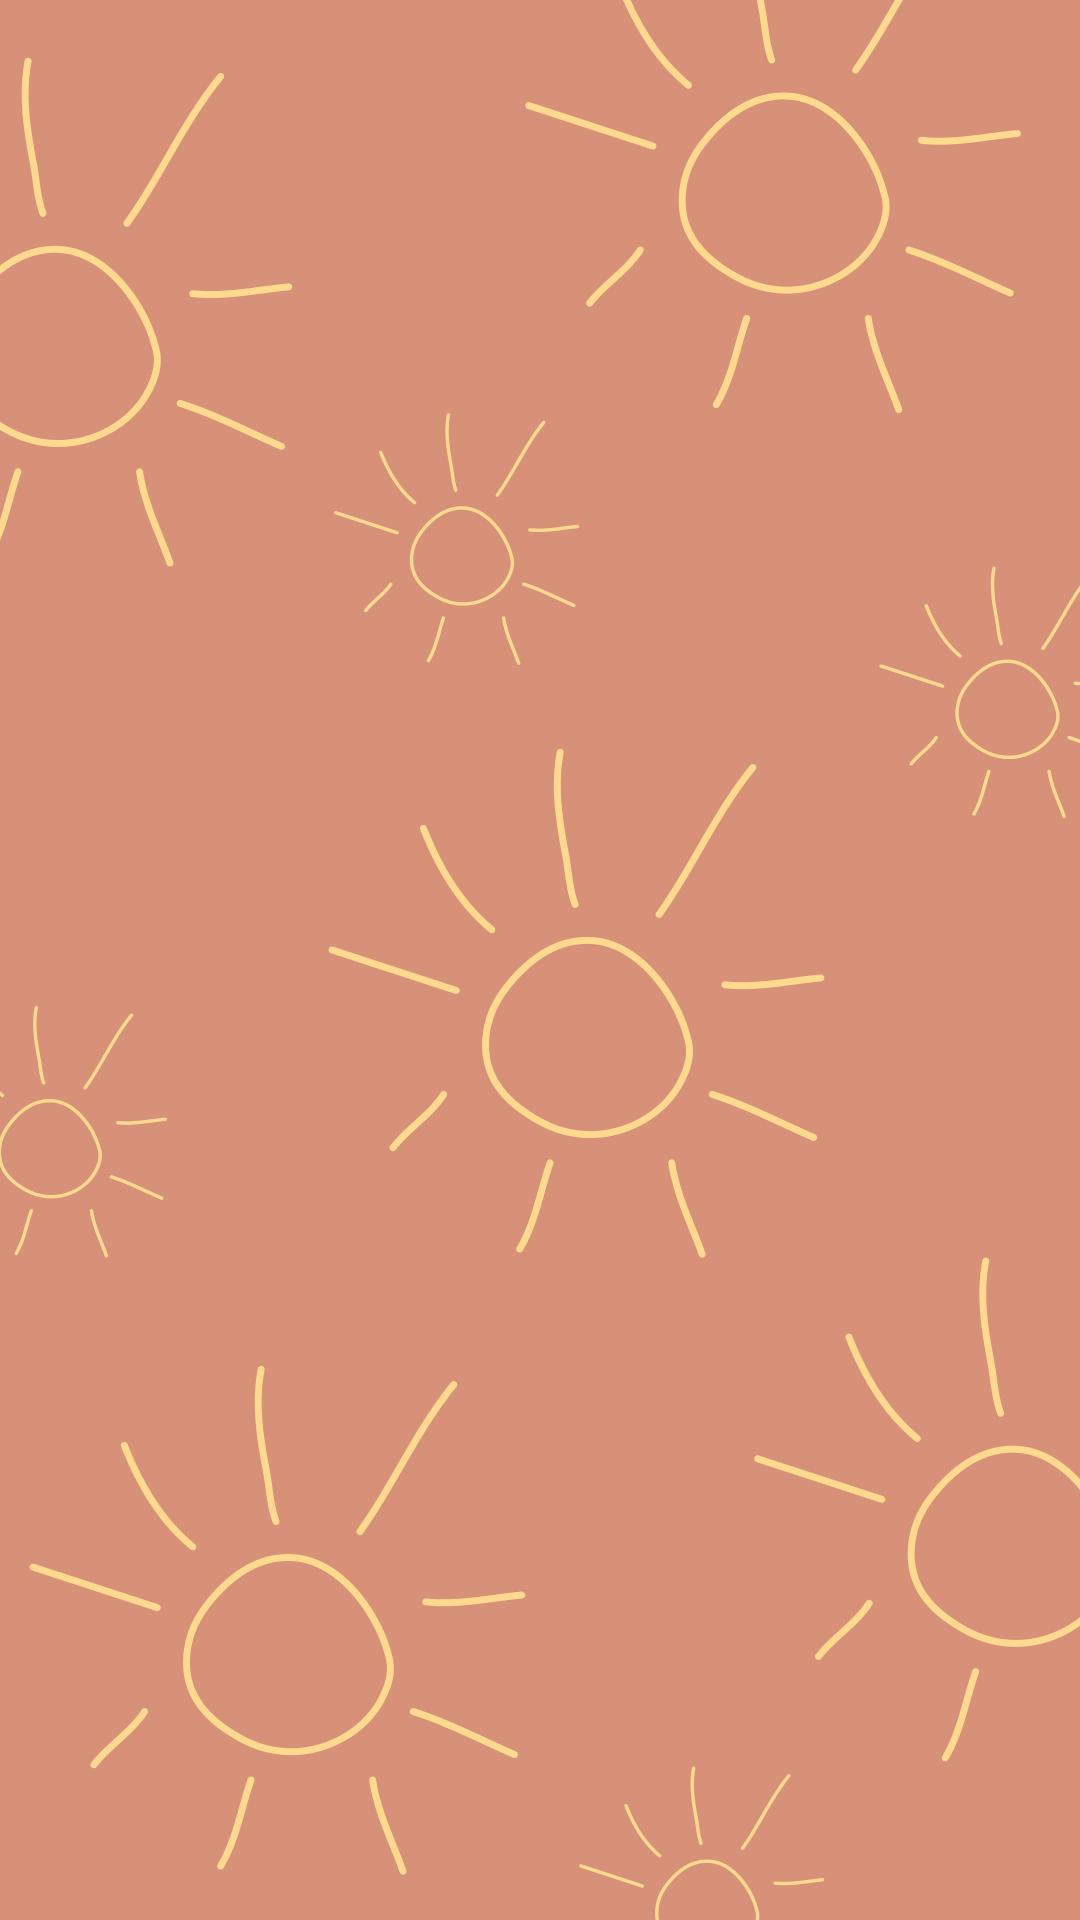 Dark Pink Wallpaper By Lara Gelders Graphic Wallpaper Cute Patterns Wallpaper Boho Wallpaper